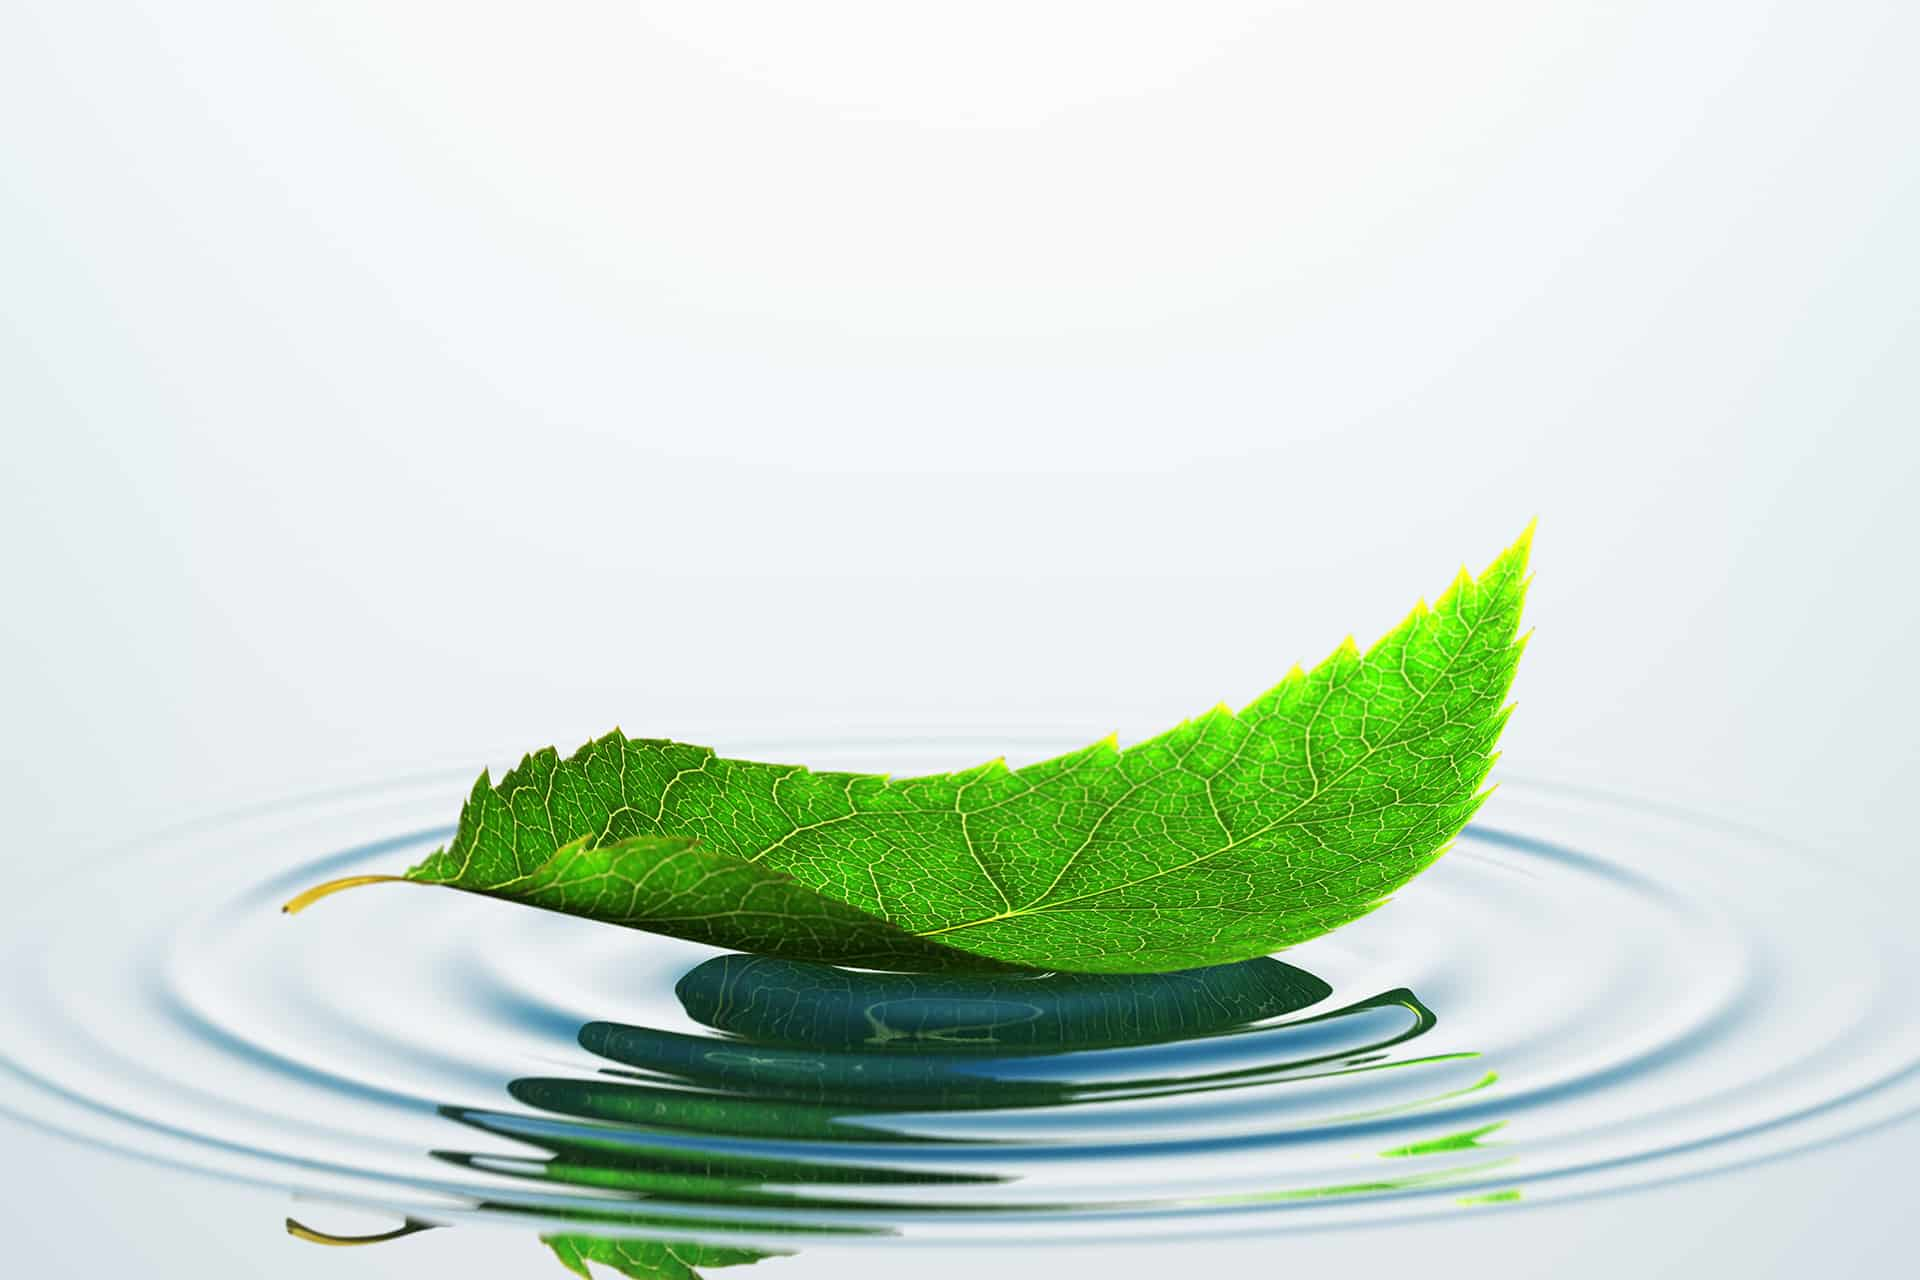 Grønt blad som flyter i vannet